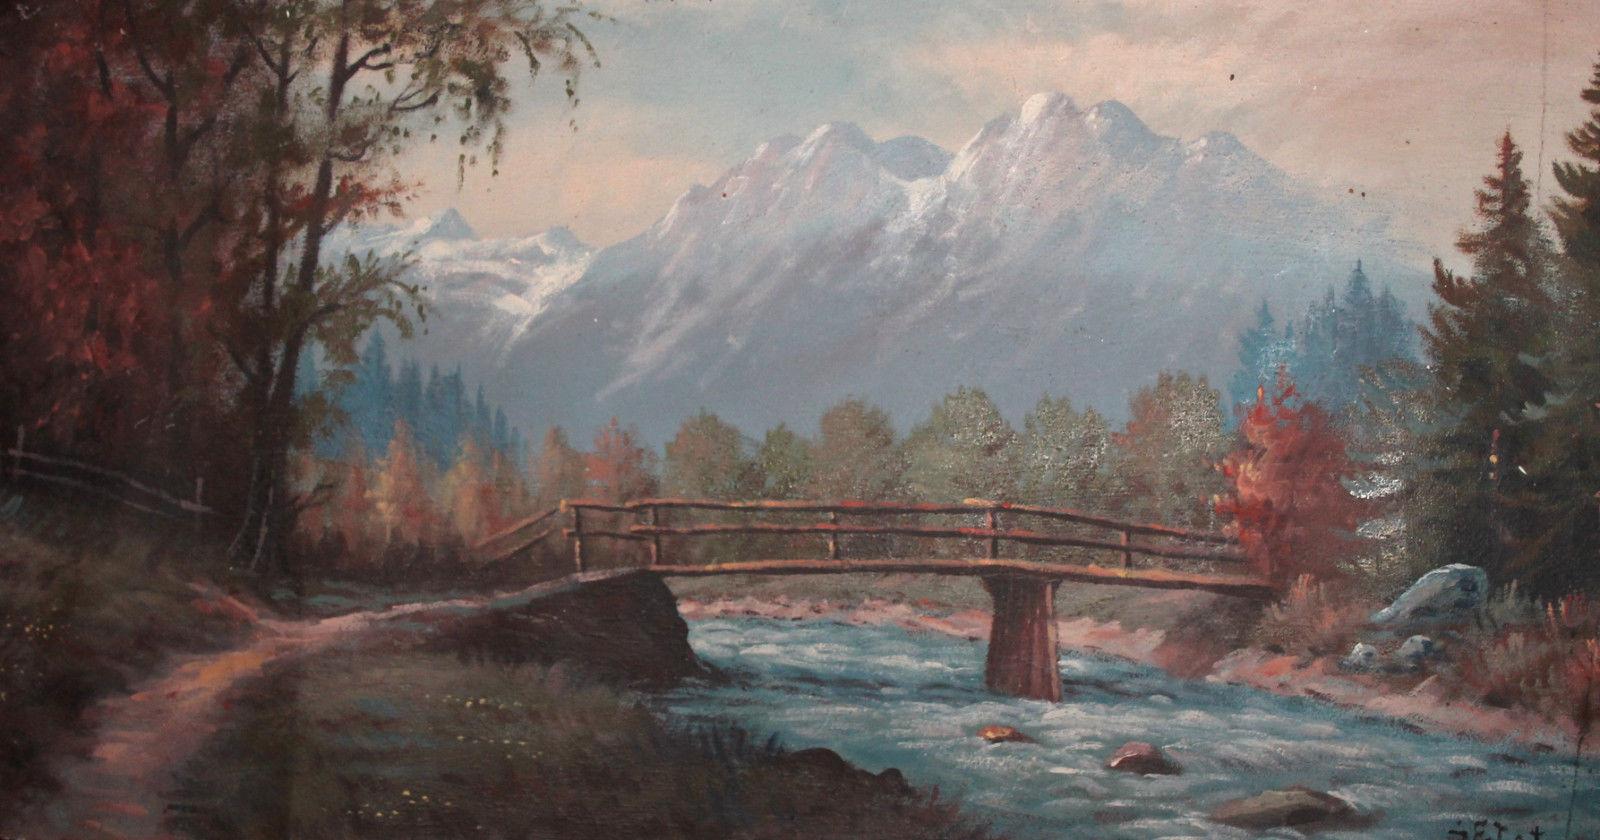 Landscape Paintings For Sale Ebay